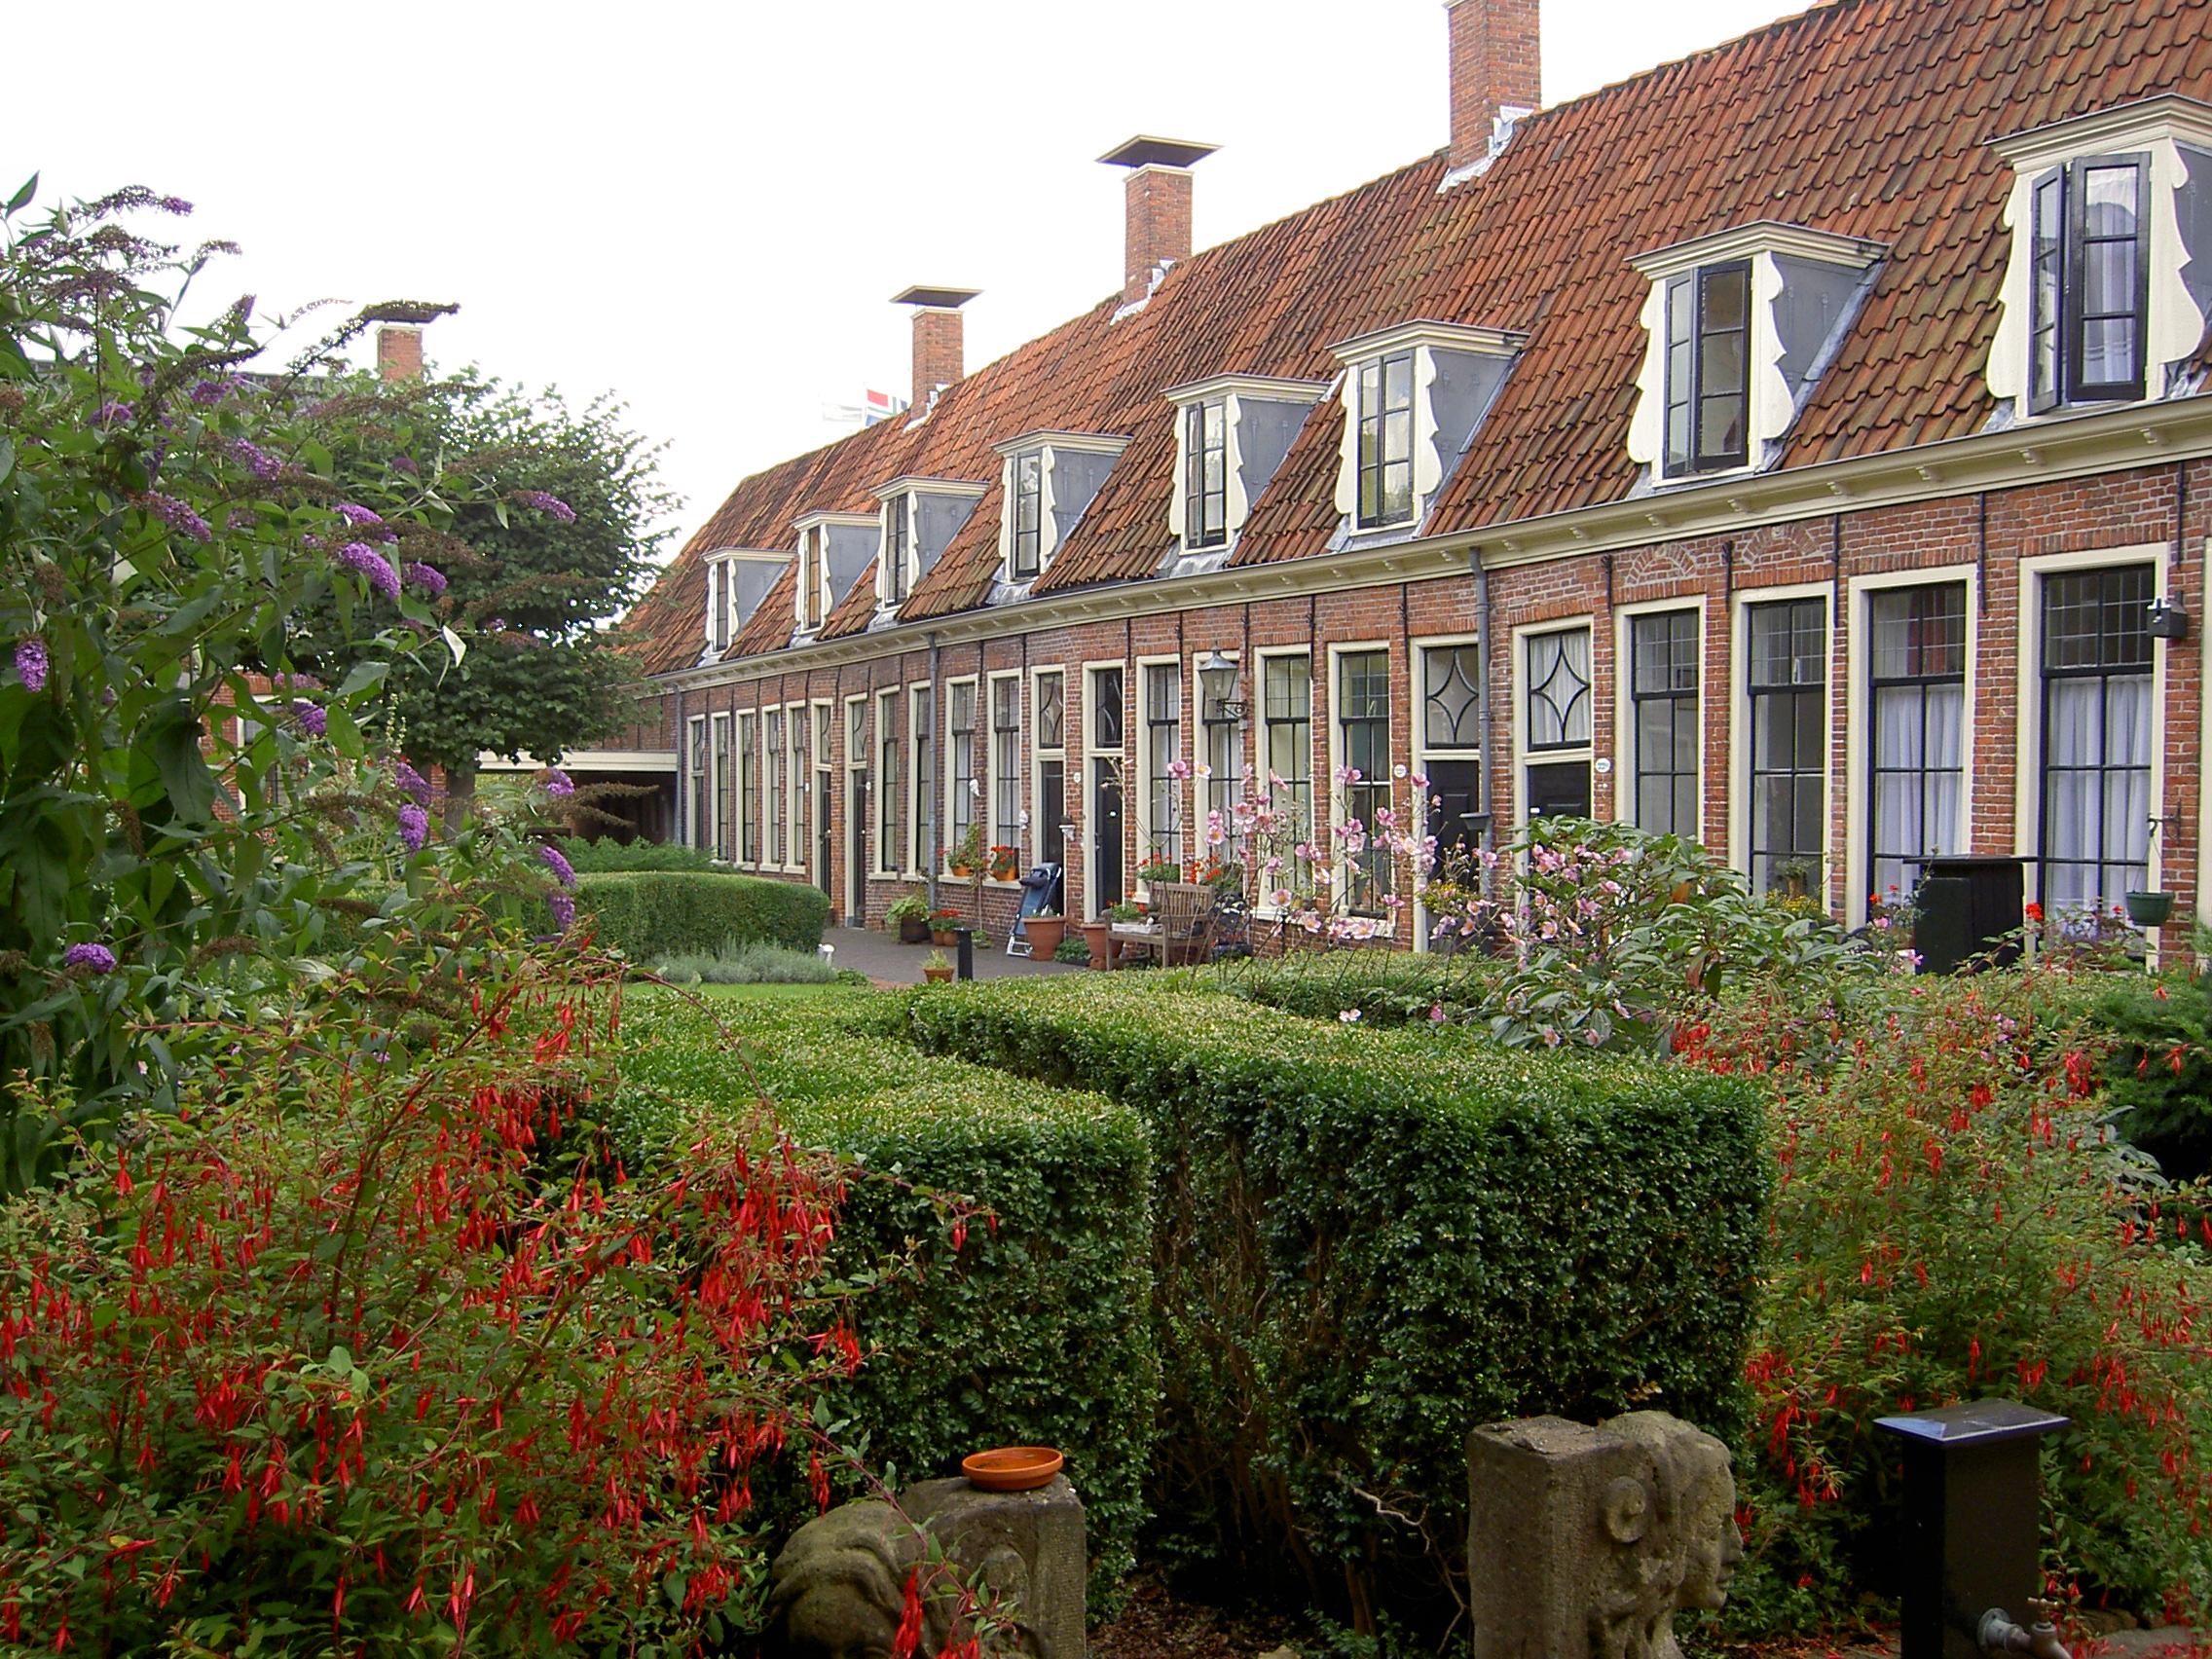 pepergasthuis met prachtige tuin